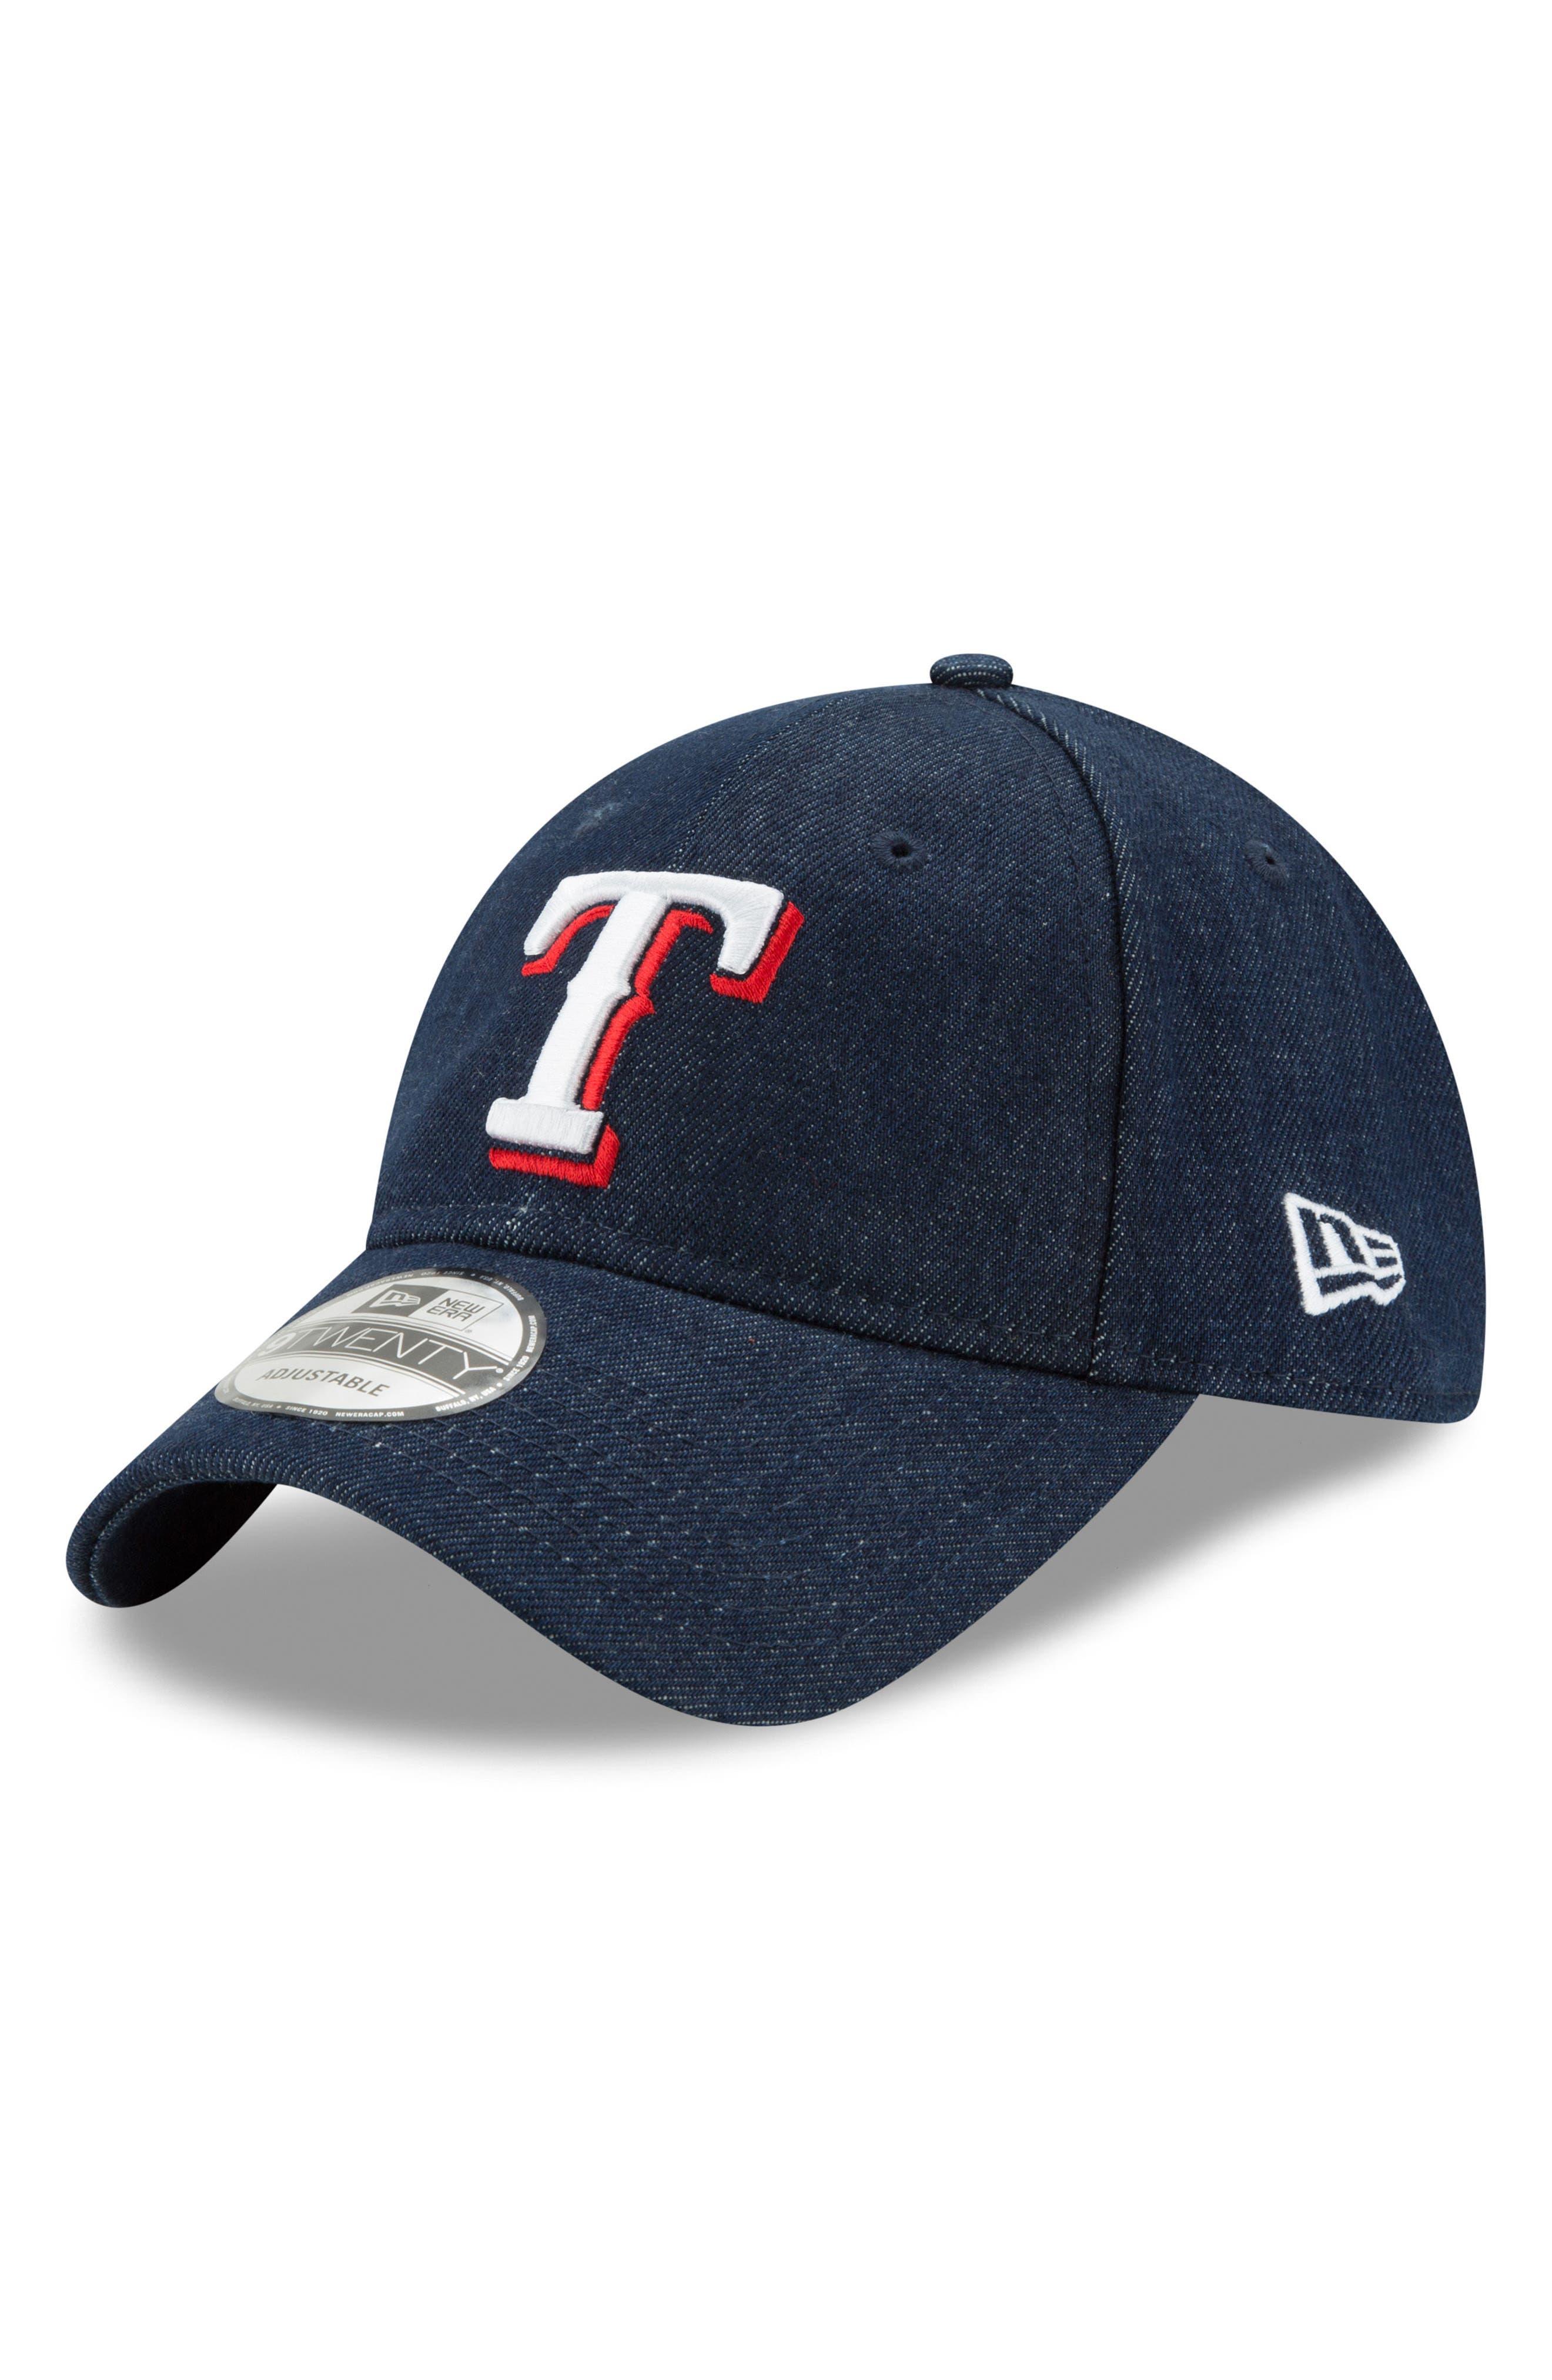 x Levi's<sup>®</sup> MLB17 Denim Baseball Cap,                             Main thumbnail 1, color,                             001